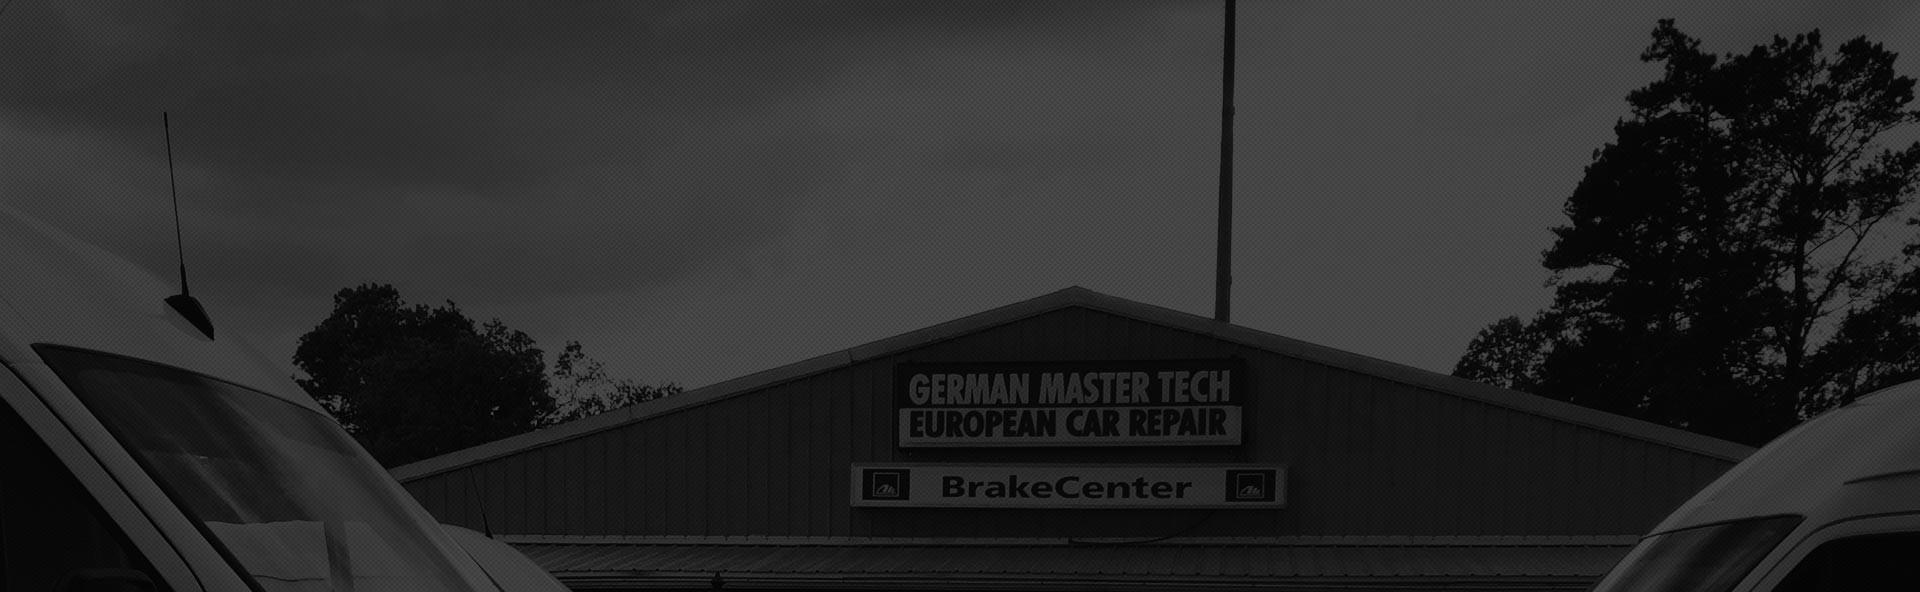 German Master Tech Auto Repair Shop in Alpharetta, GA